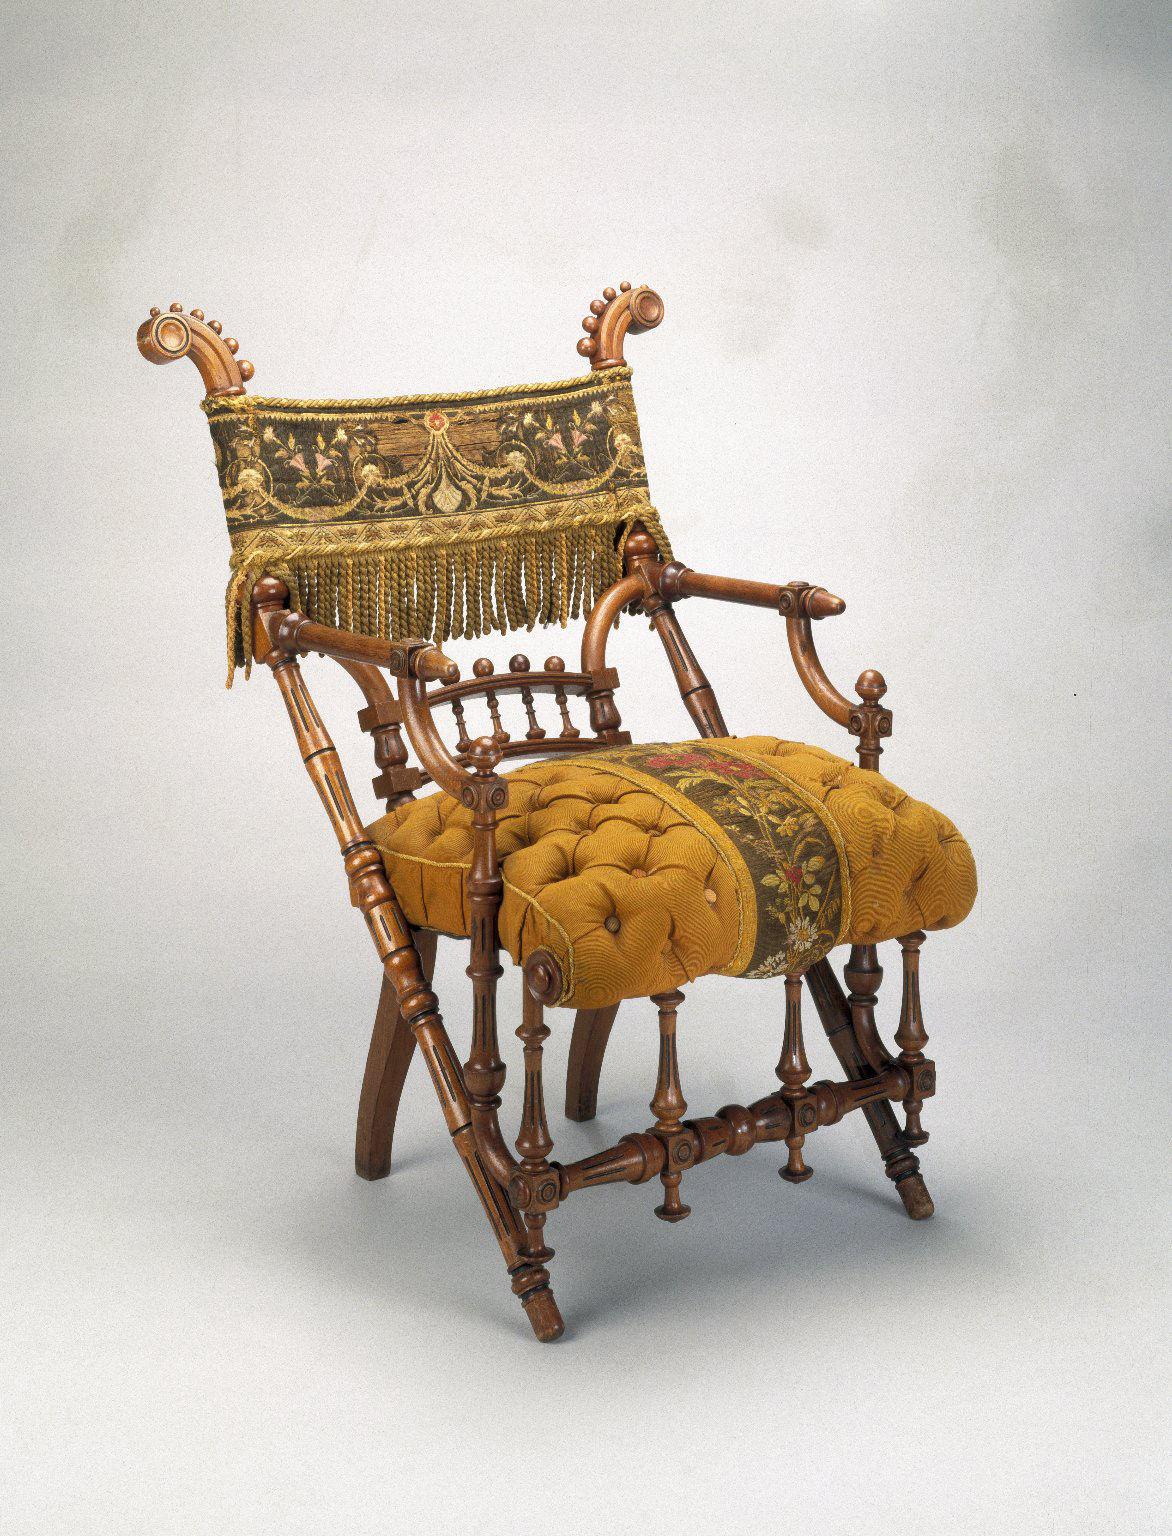 Jean McClelland: Sought After Hunzinger Furniture Reflects Ornate  Sensibilities Of Its Era